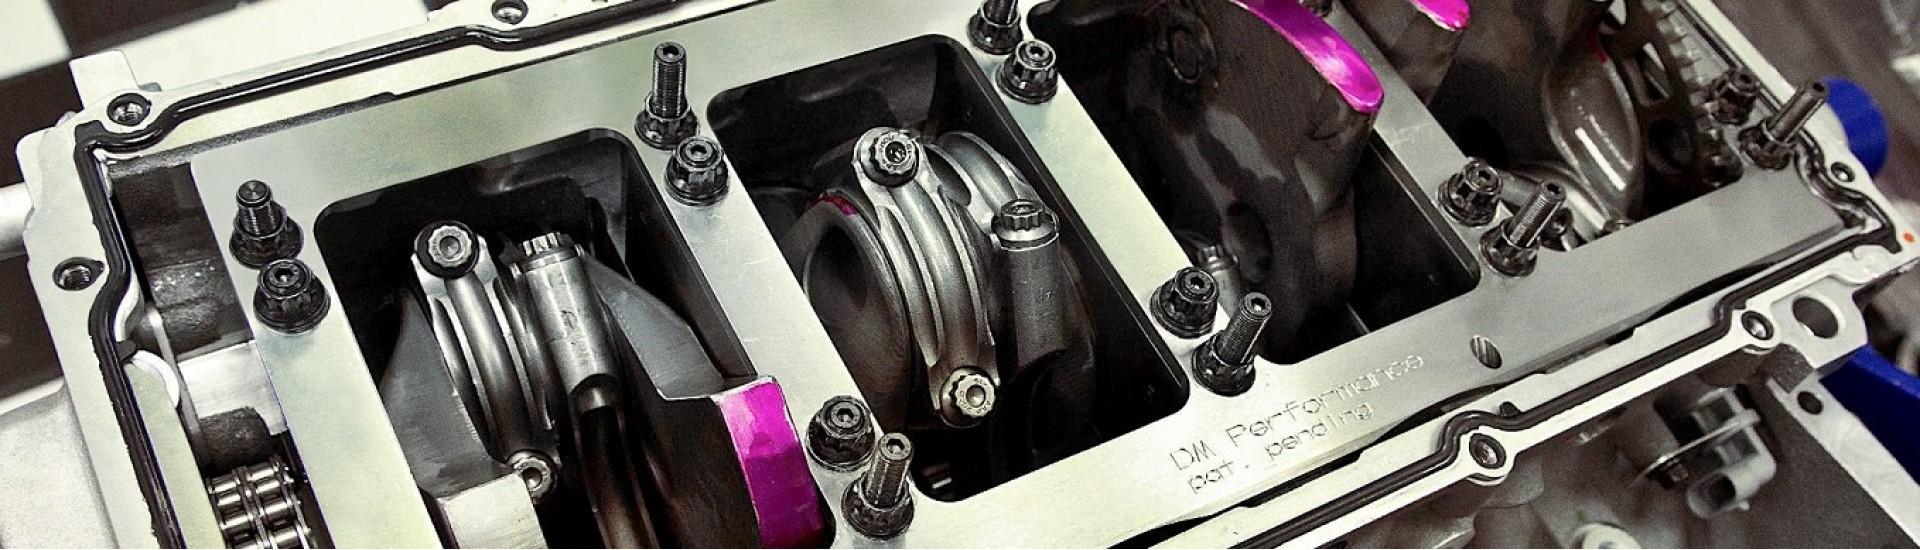 قطعات موتور پرفورمنس ، performance engine parts